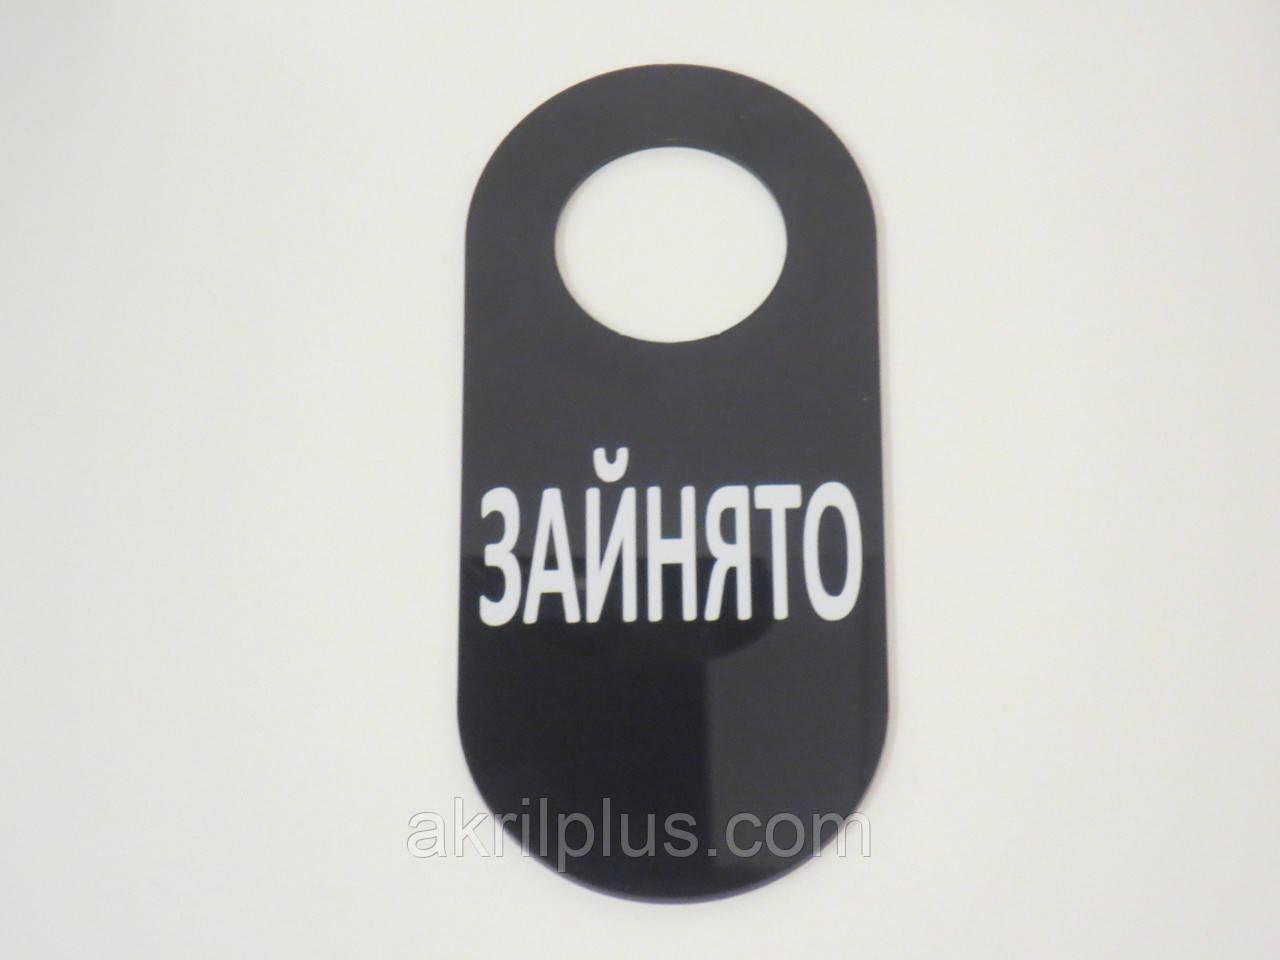 Табличка - хенгер на дверную ручку свободно/занято